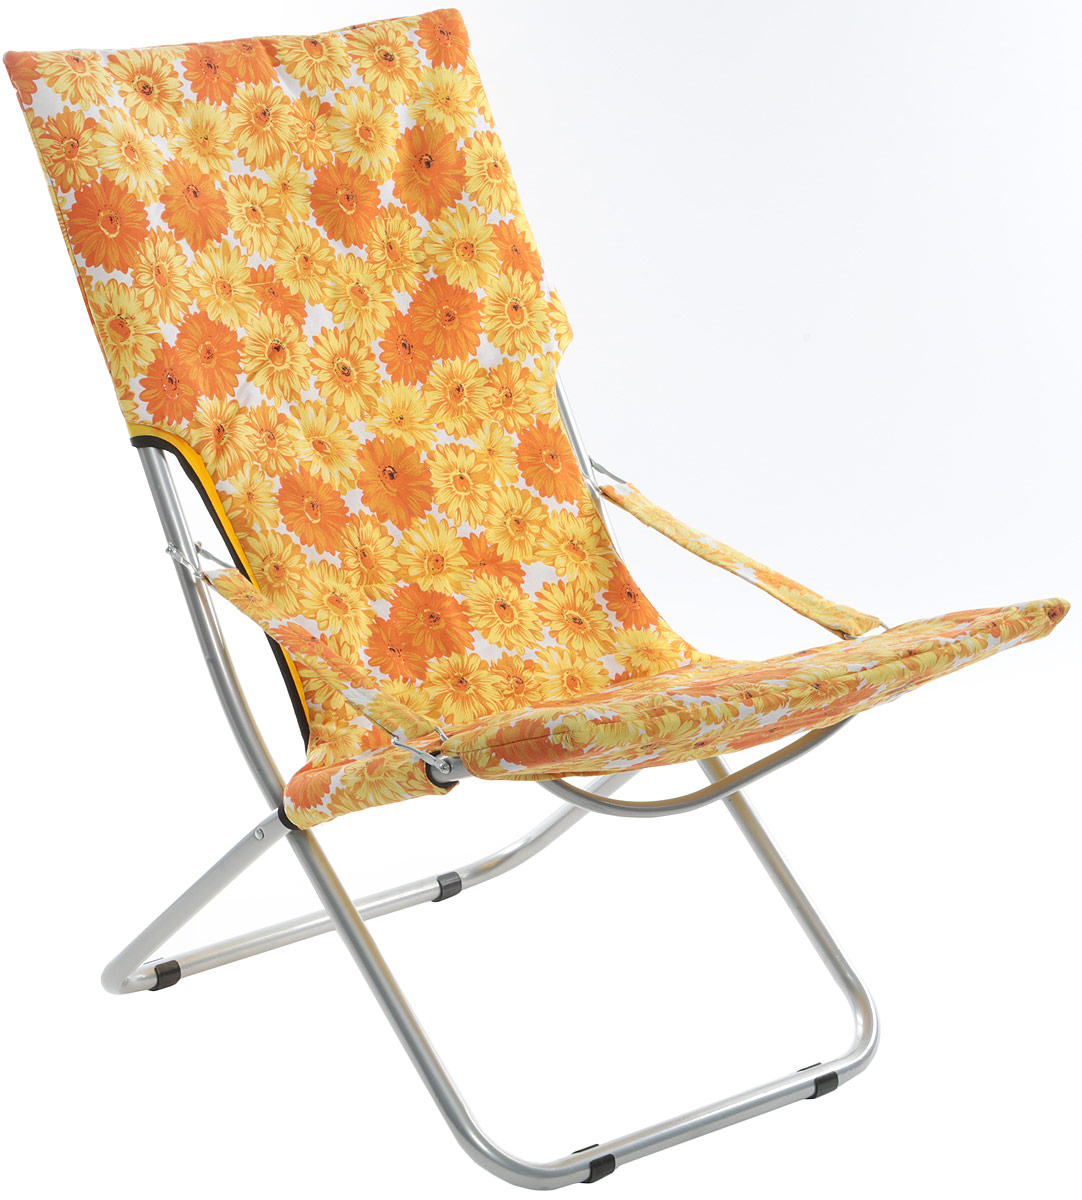 "Кресло складное ""Wildman"", цвет: желтый, 73 х 60 х 100 см"